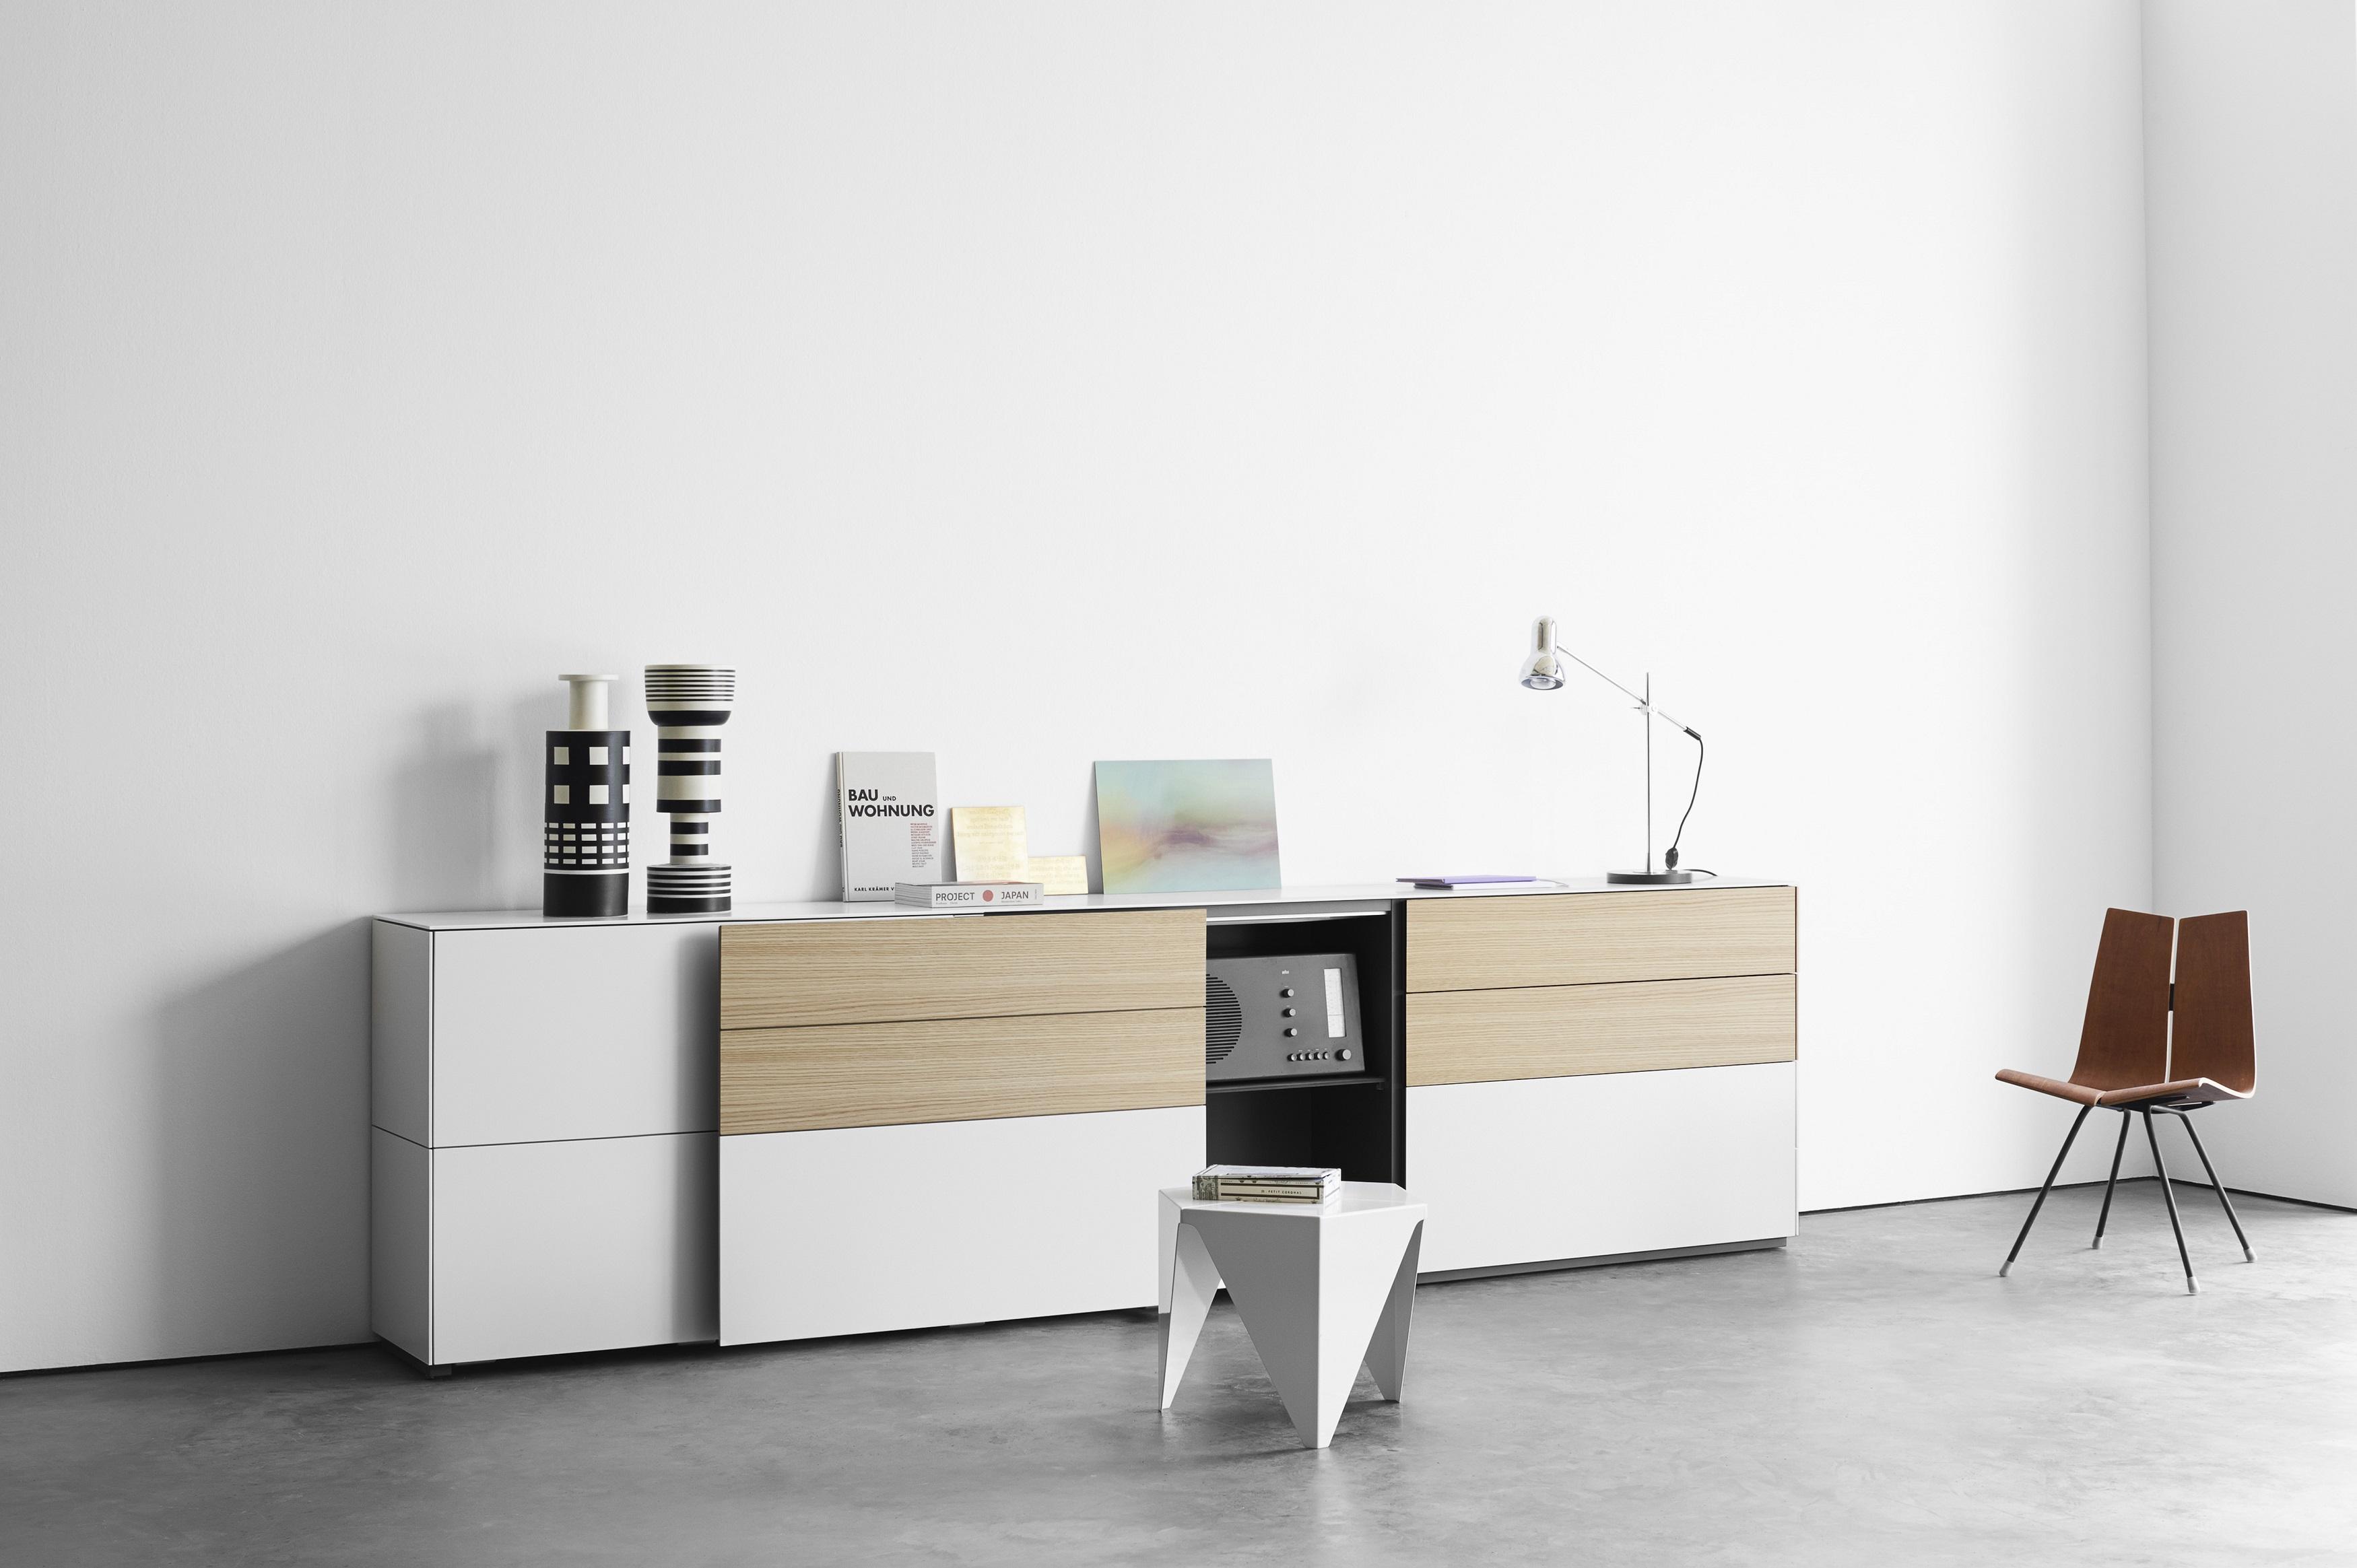 kettnaker pfannes virnich die wohnberater. Black Bedroom Furniture Sets. Home Design Ideas